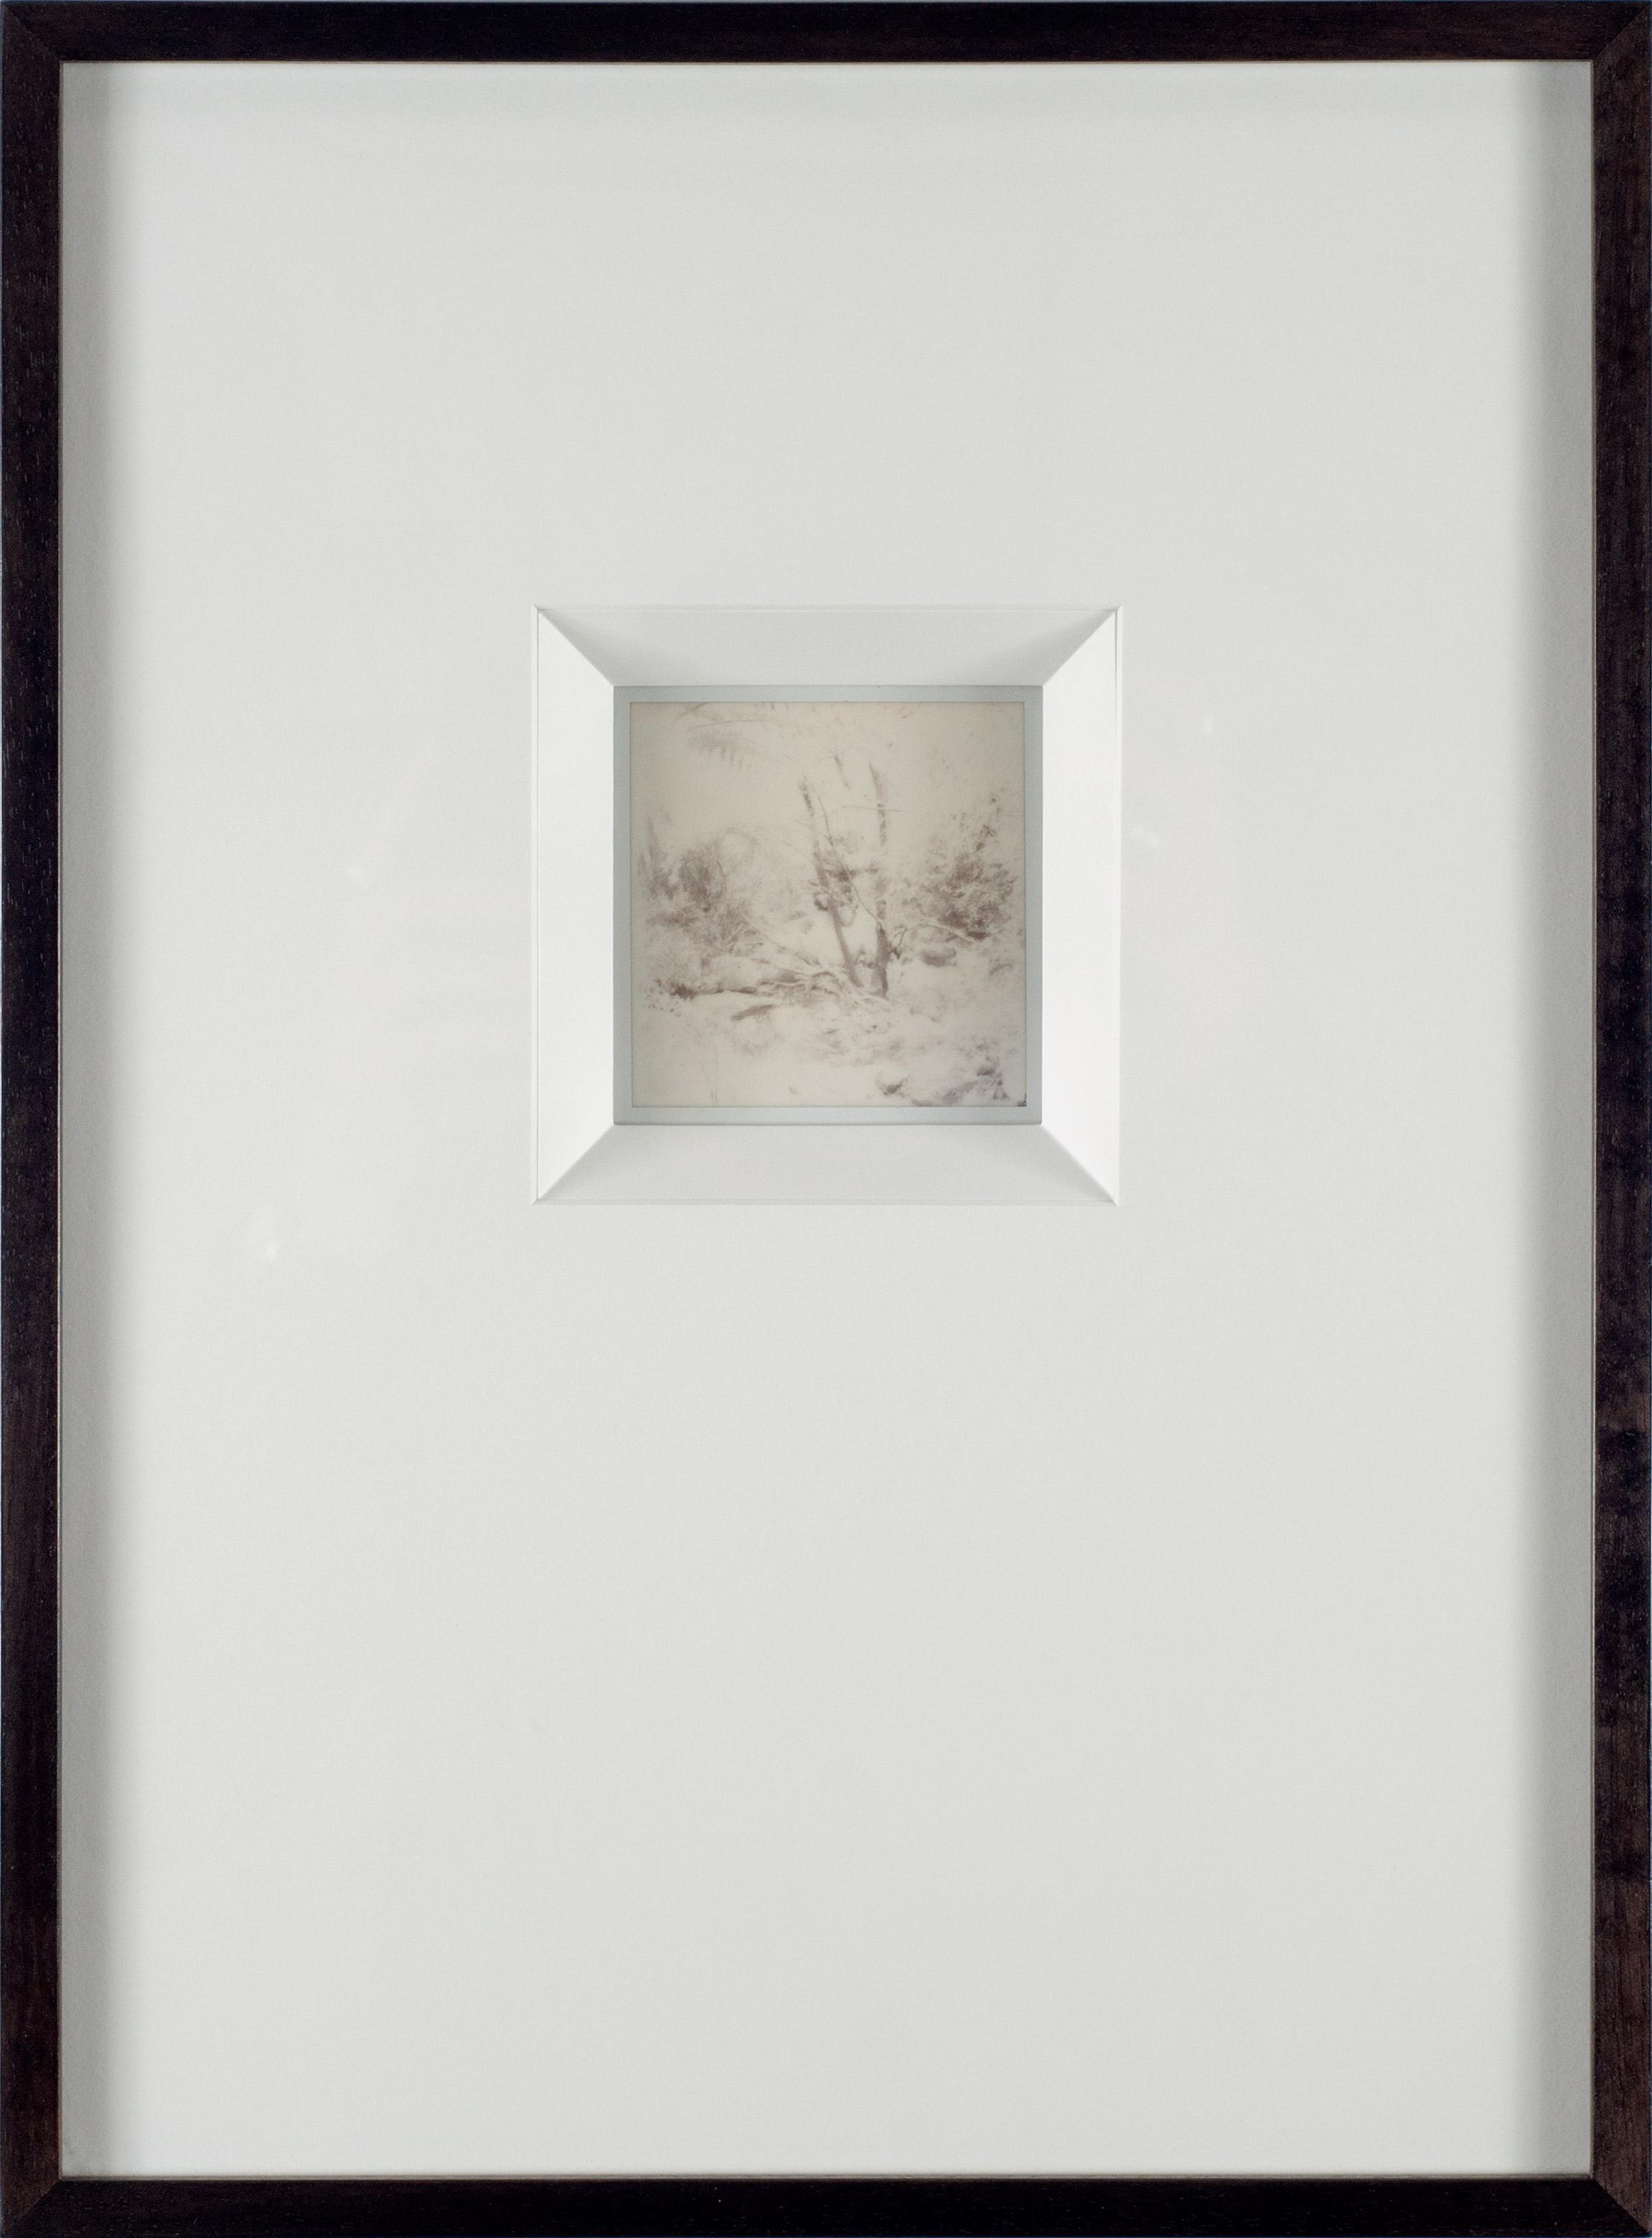 7.A.Hodgkinson - Untitled 2 - 2018 - Polaroid print - 42.5x31.5cm.jpg